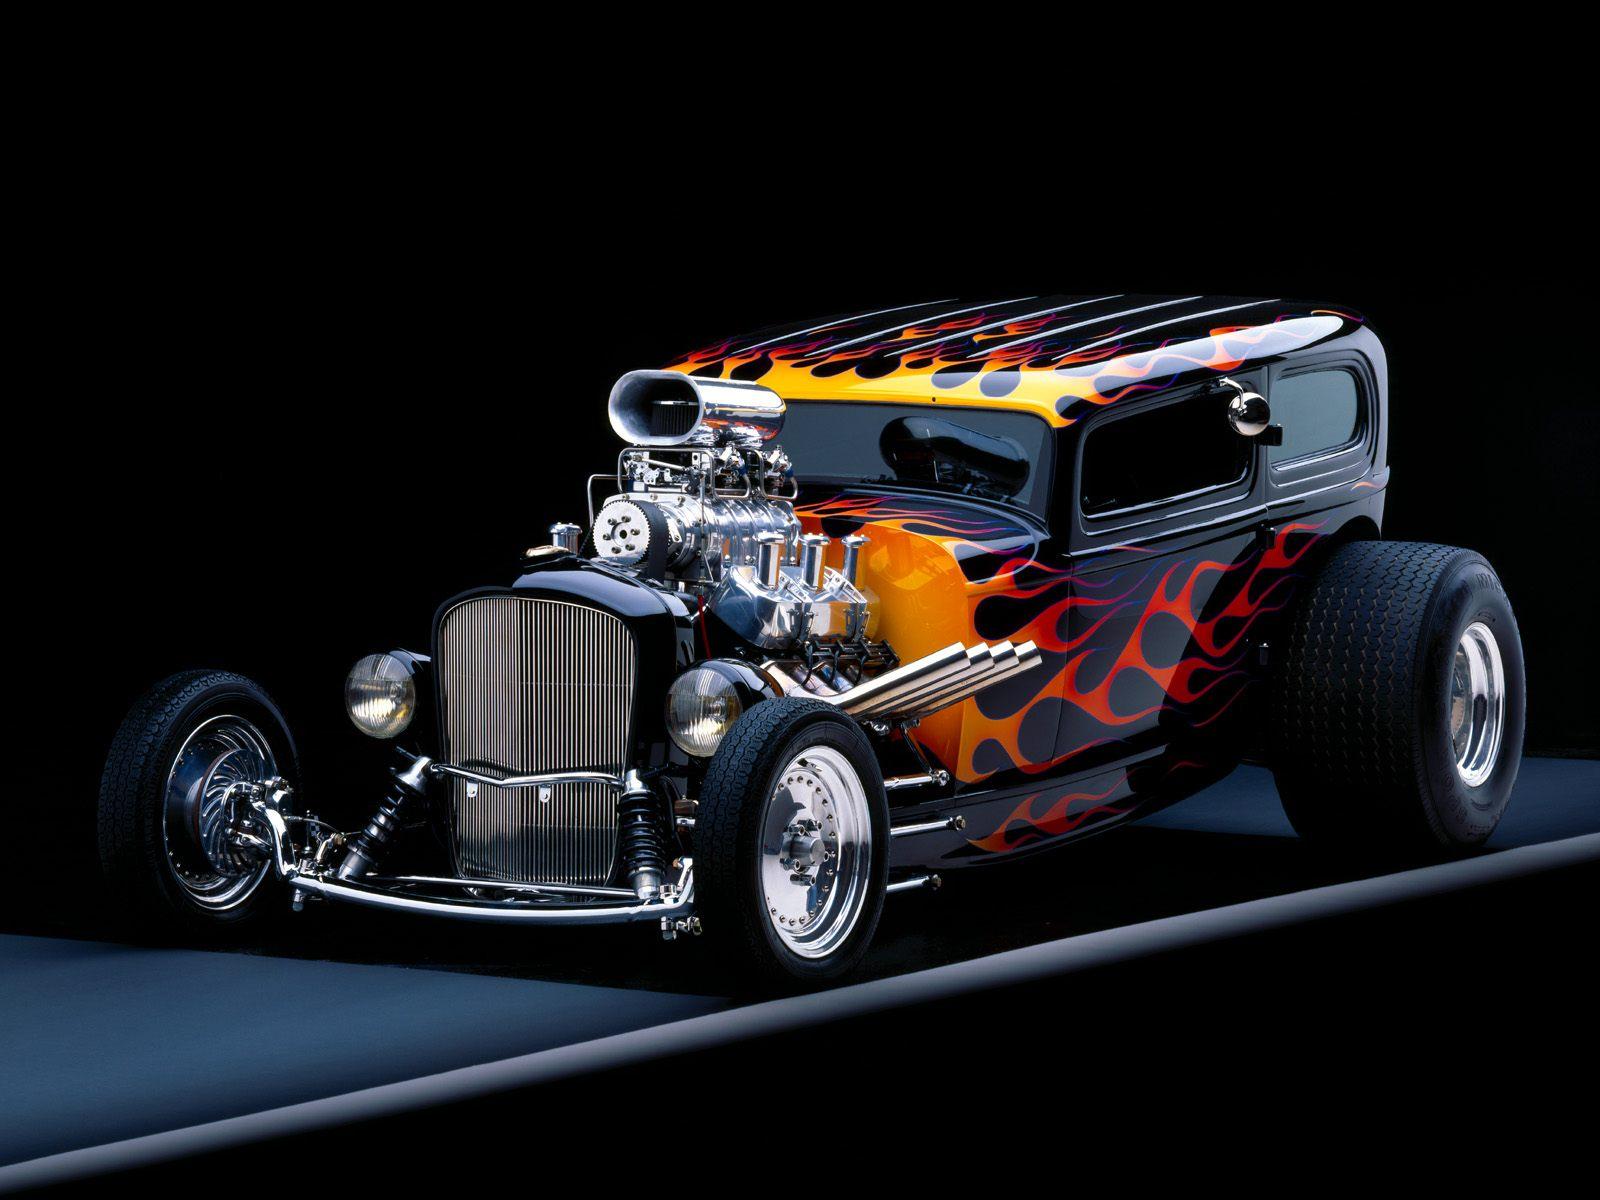 Hot Rod Wallpaper 5328 Wallpaper Wallpaper hd 1600x1200